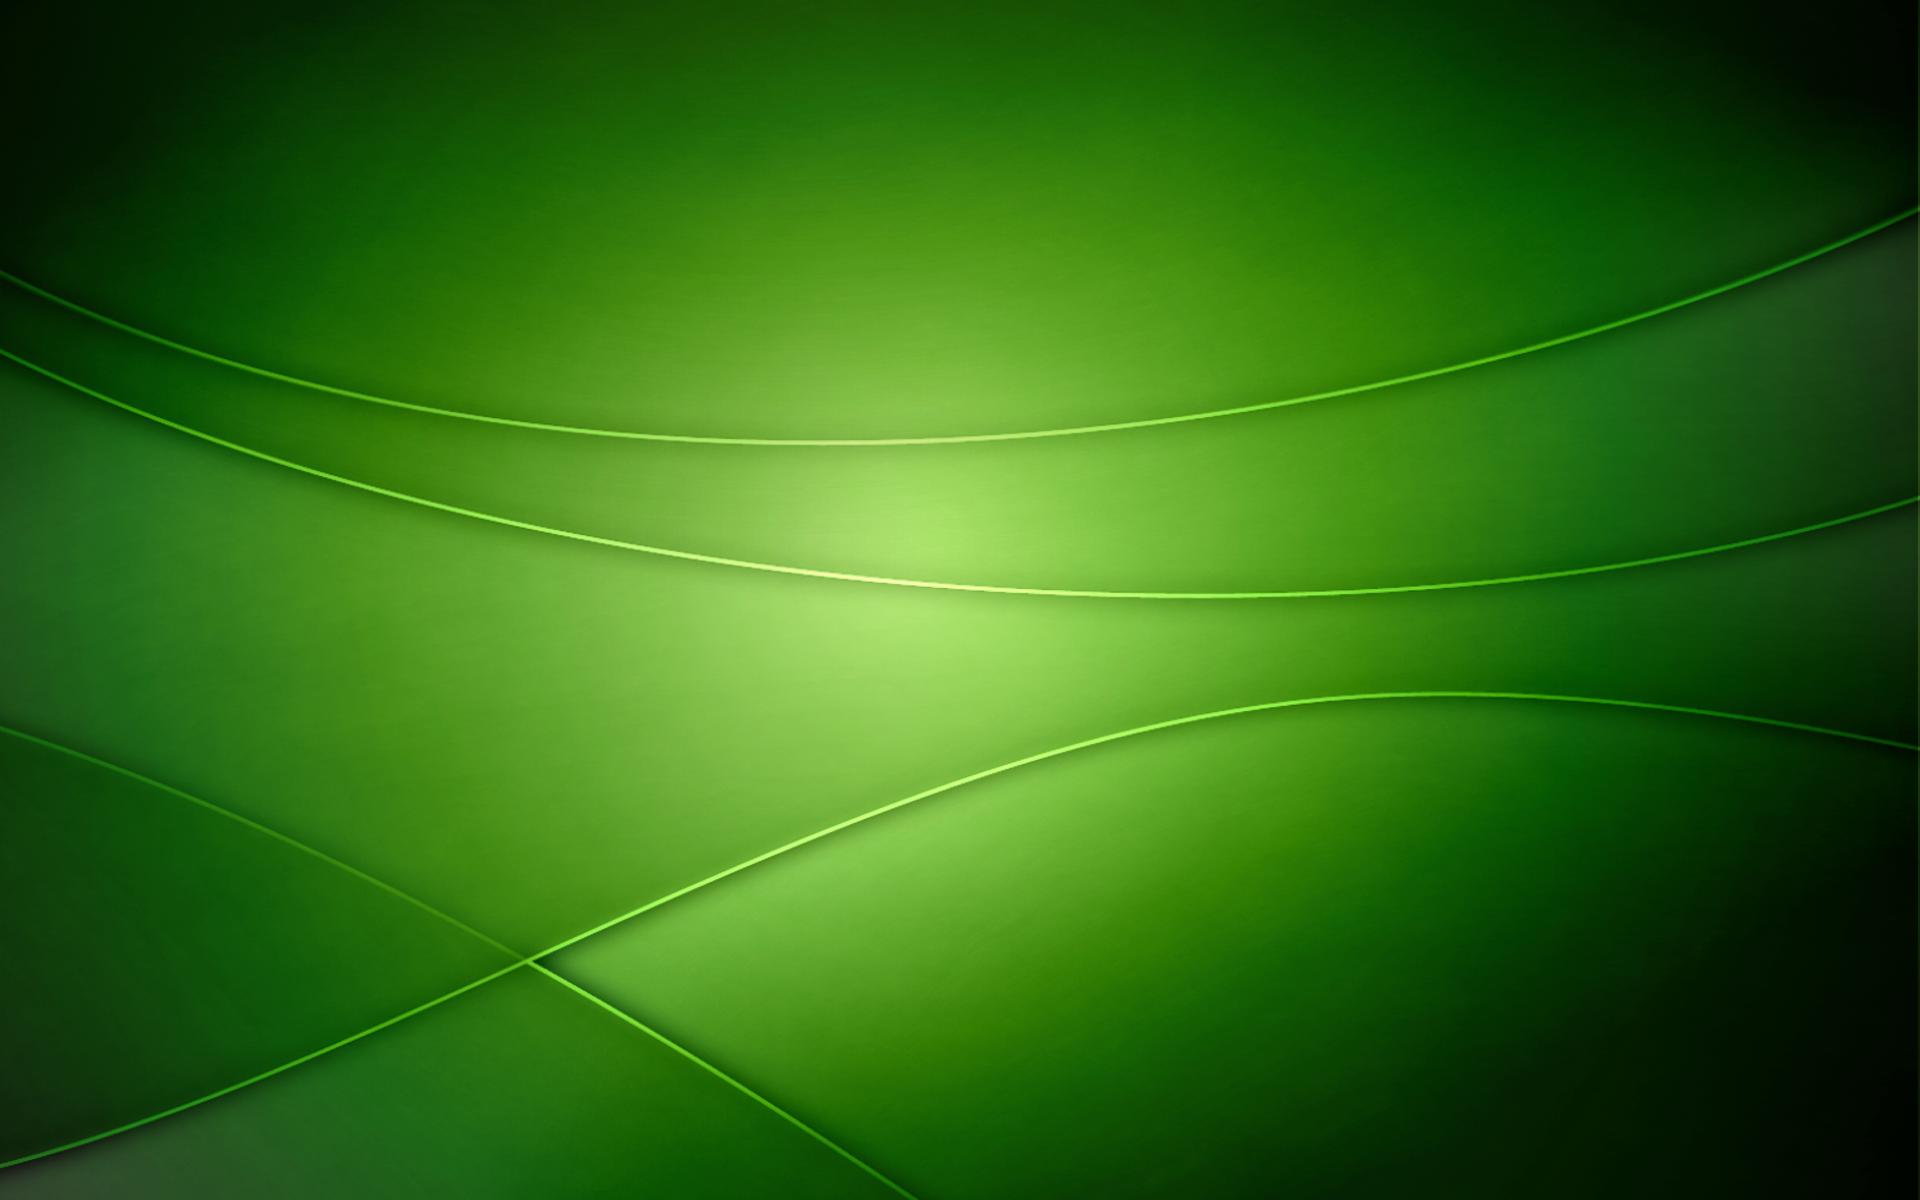 Зеленый фон картинка